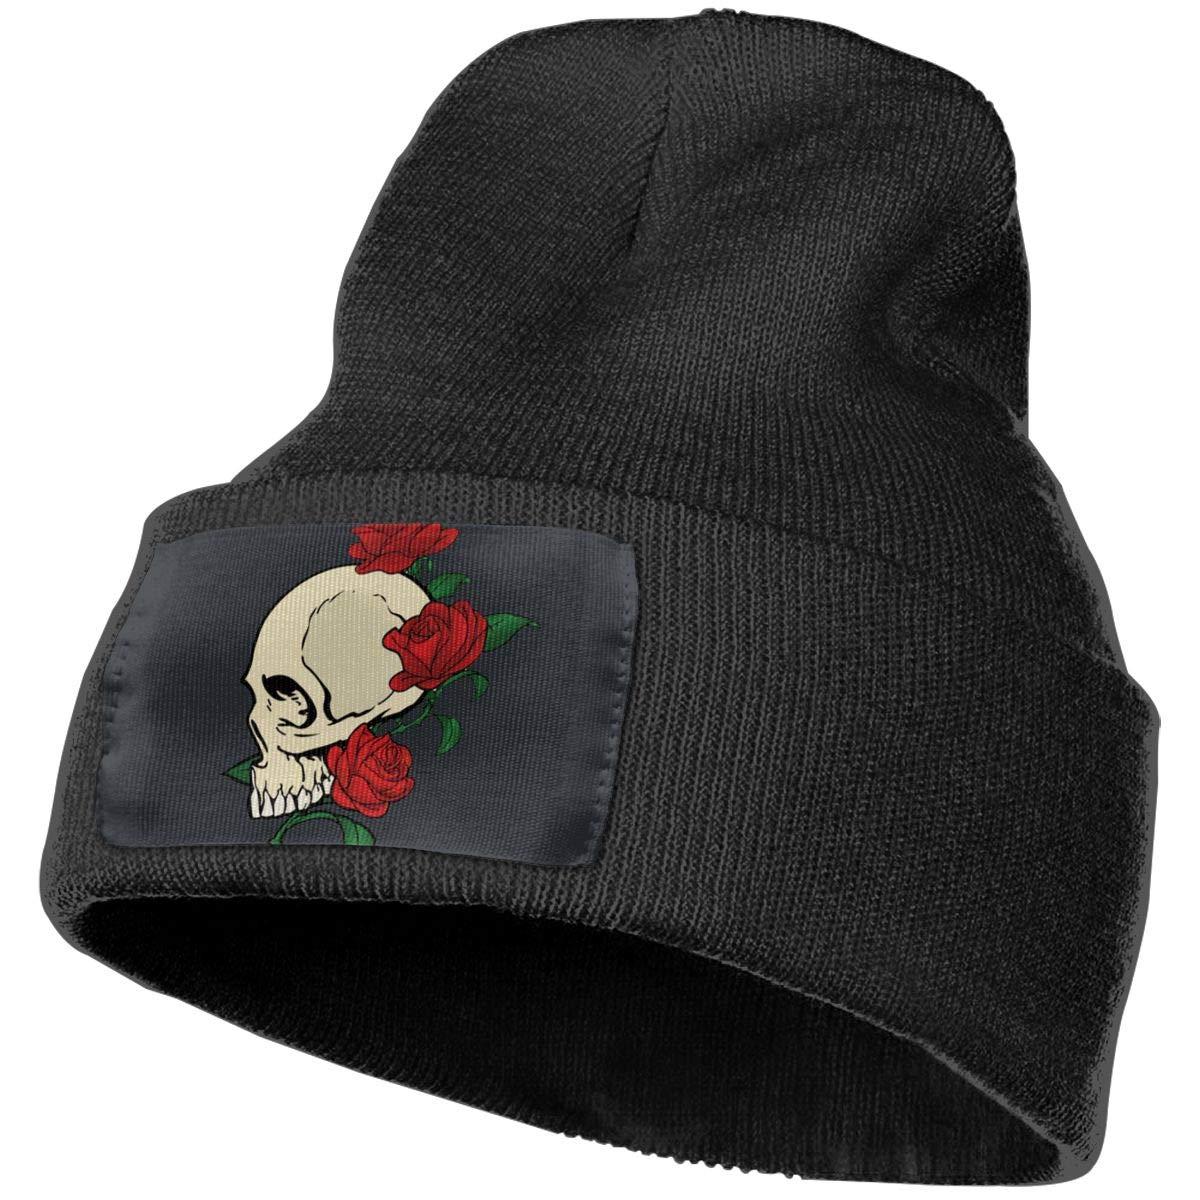 Horizon-t Crazy Skull Unisex 100/% Acrylic Knitting Hat Cap Fashion Beanie Hat